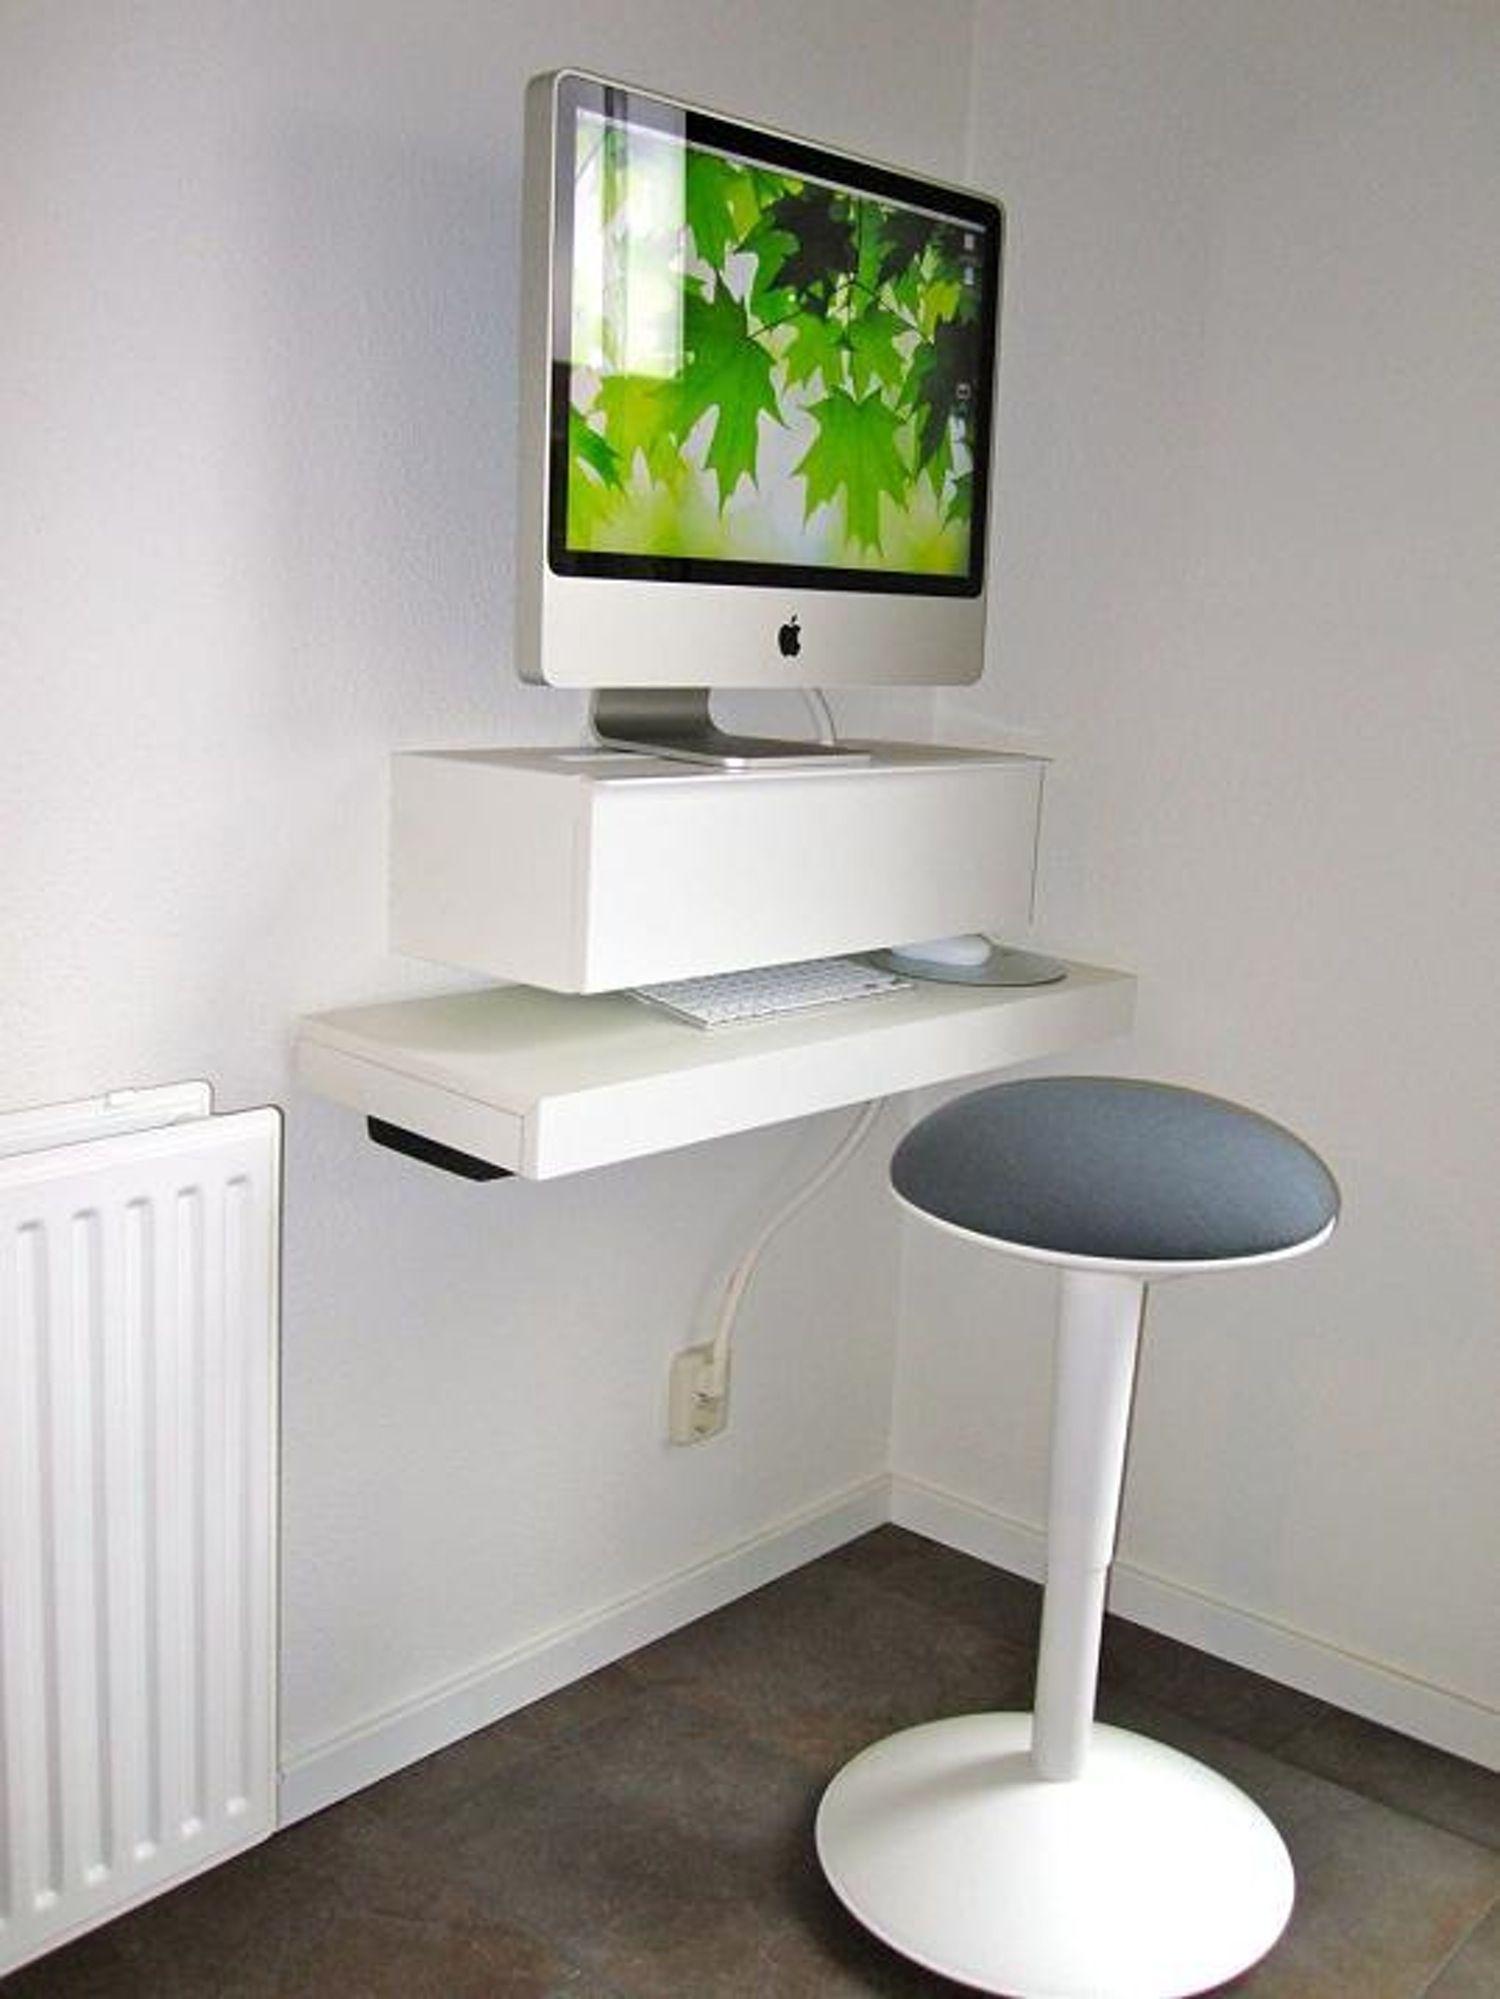 Uberlegen Create A Small Floating IMac Workspace With Ikea Shelves